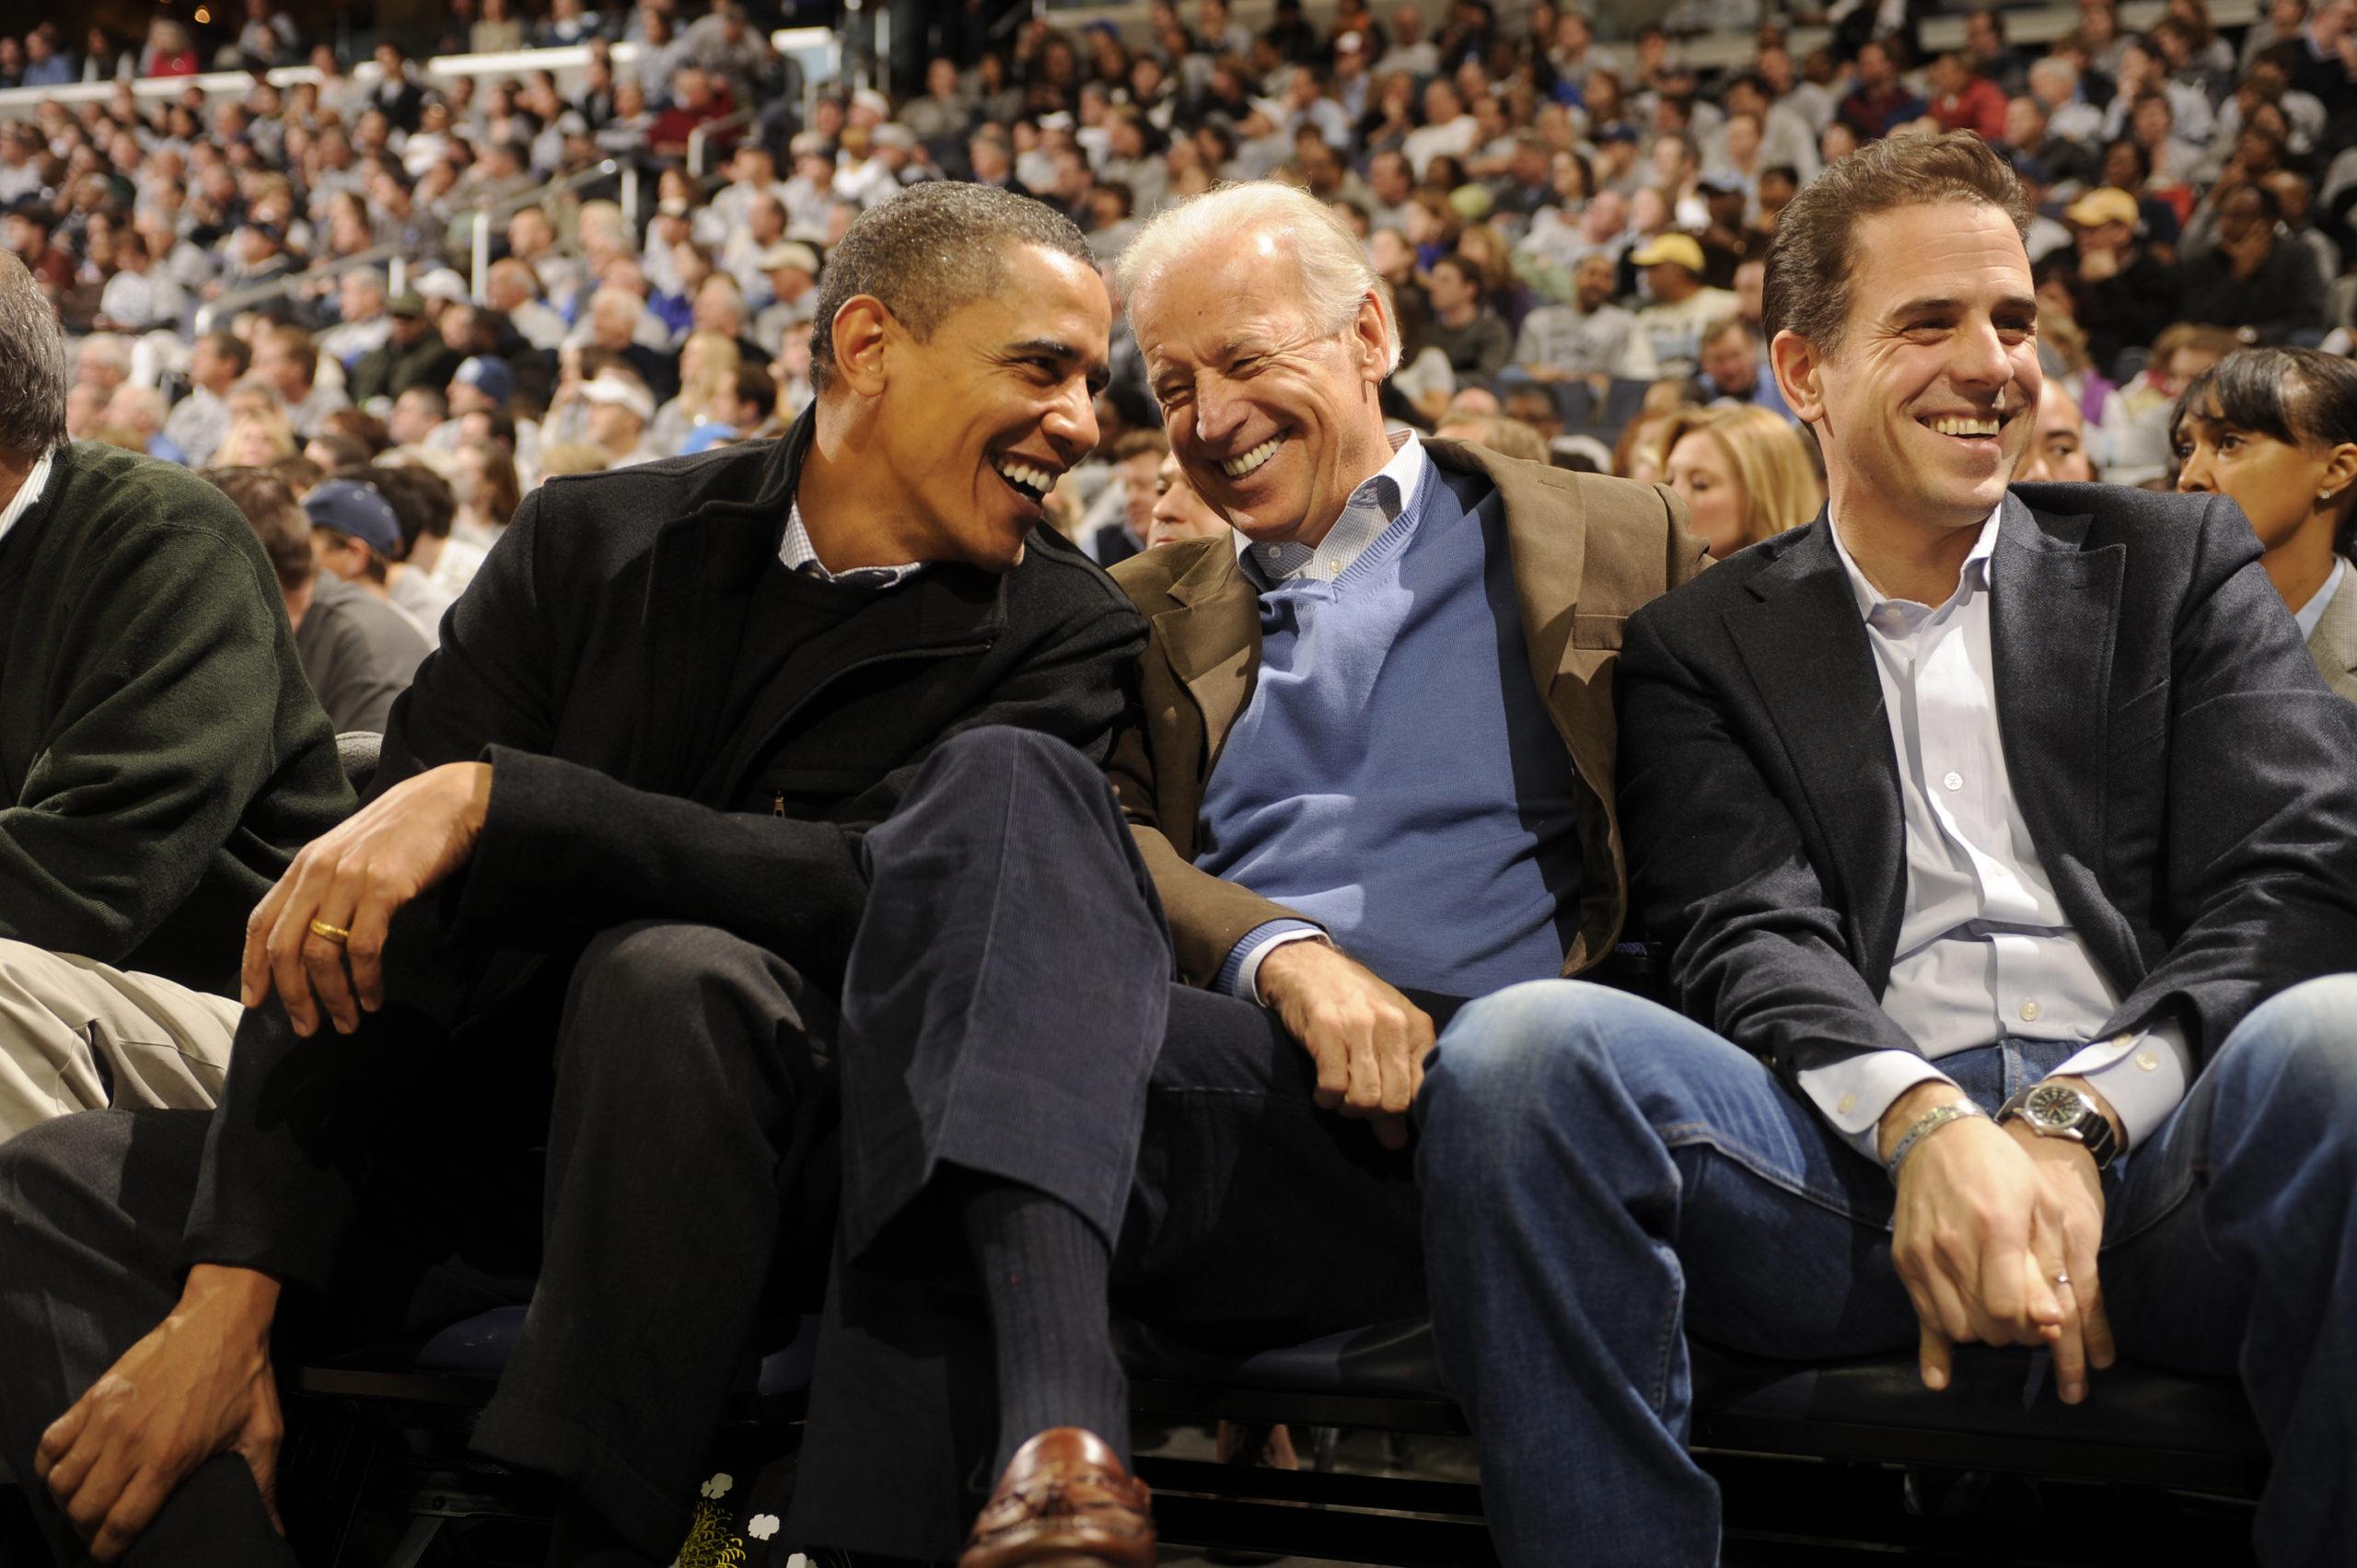 Former President Barack Obama, Joe Biden and Hunter Biden attend a 2010 basketball game. (Mitchell Layton/Getty Images)